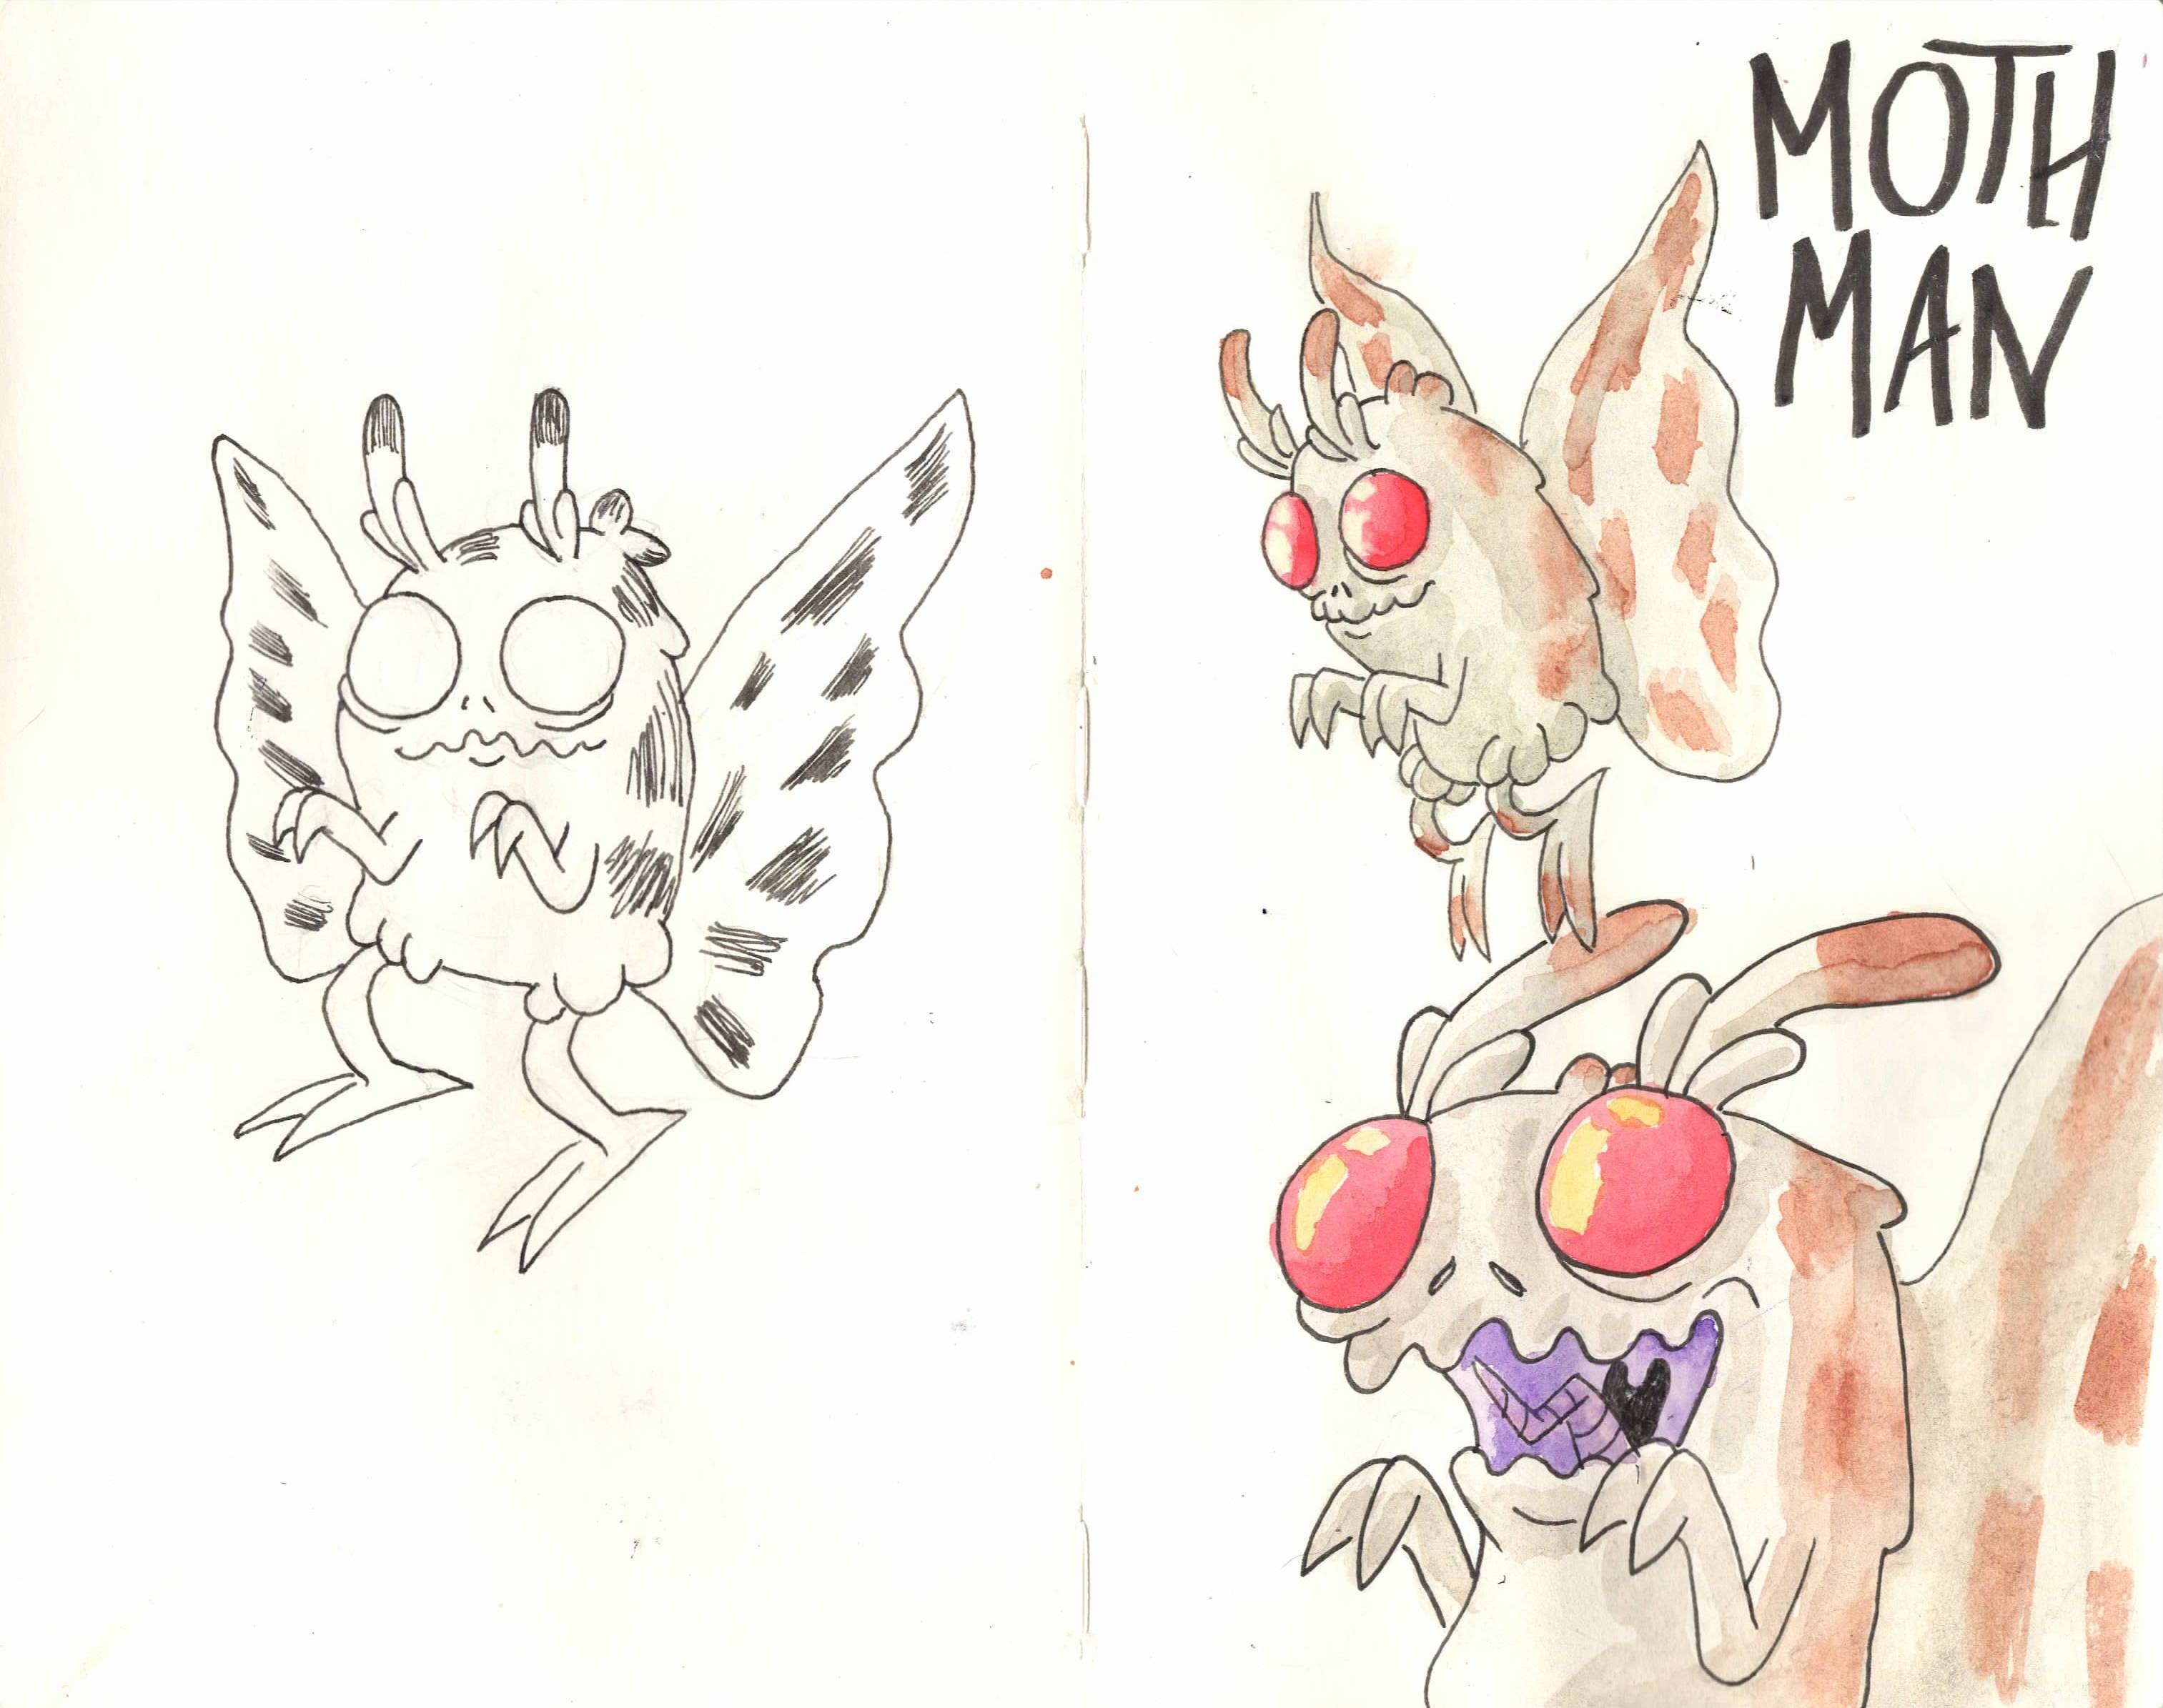 Mothman sketchs